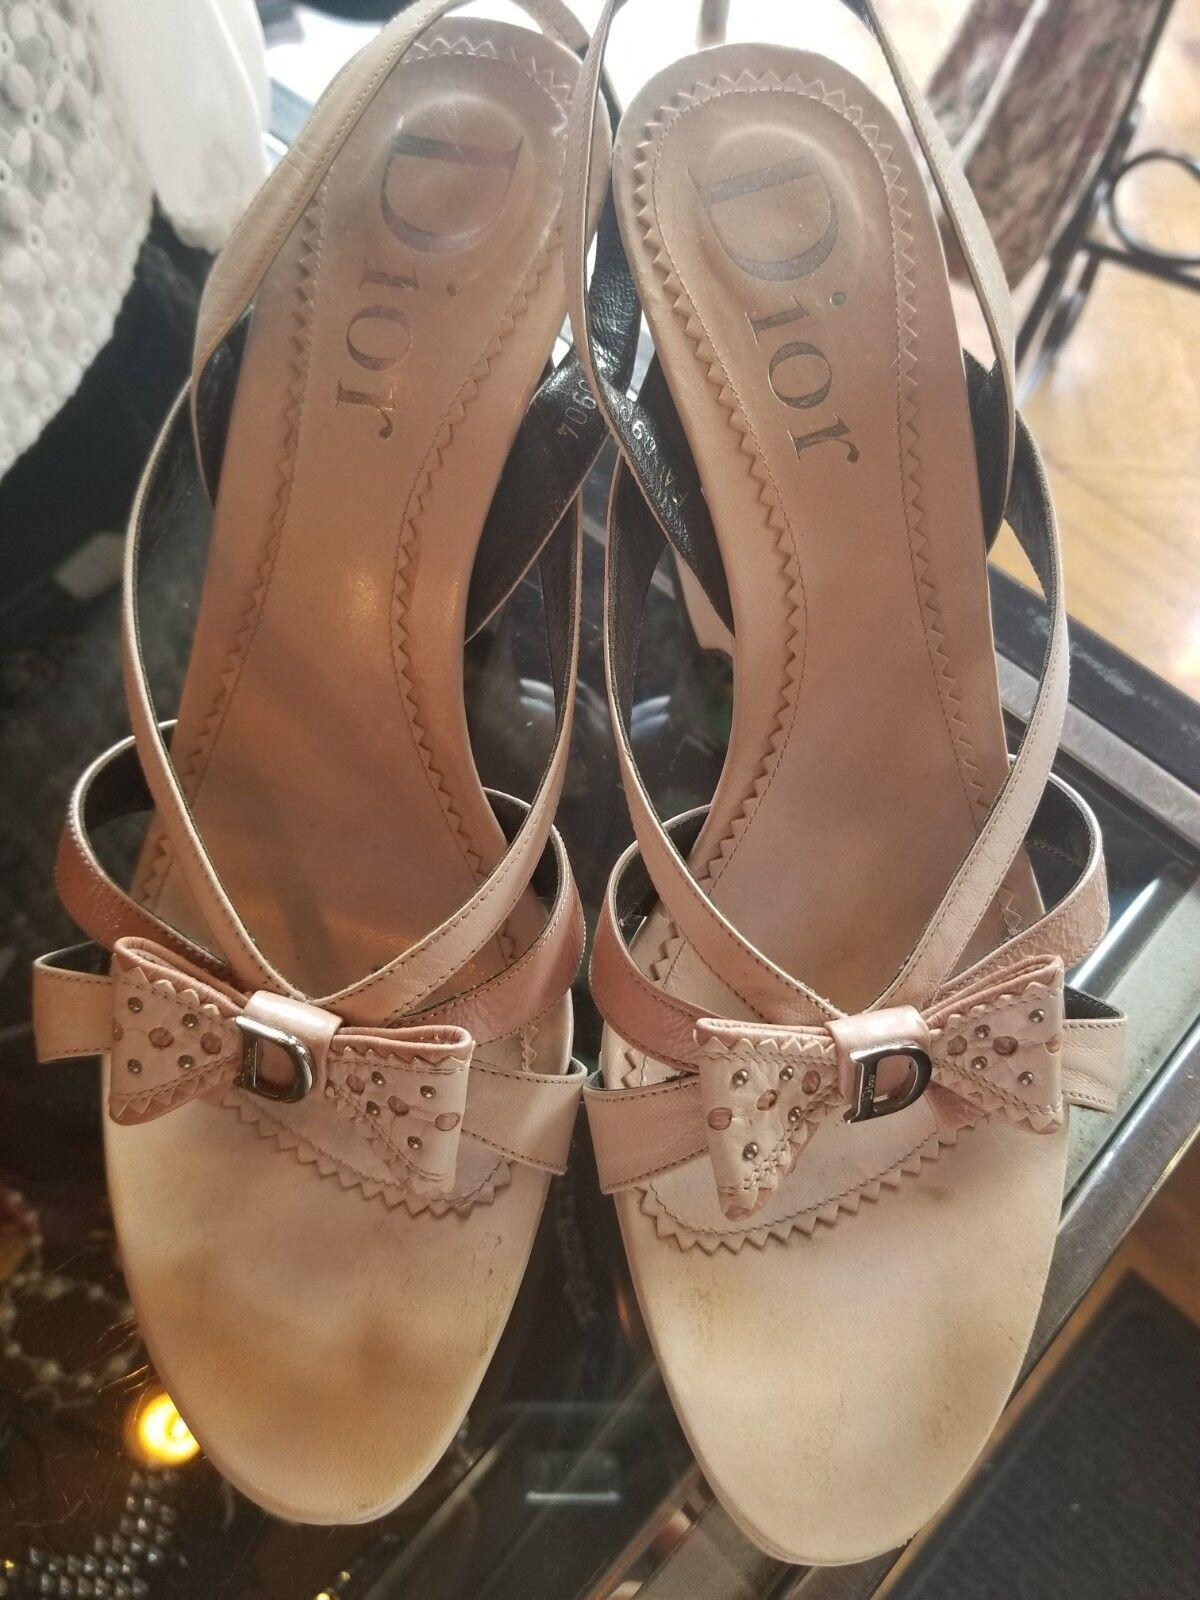 Dior bluesh Pink wedge Sandals sz 10.5 41